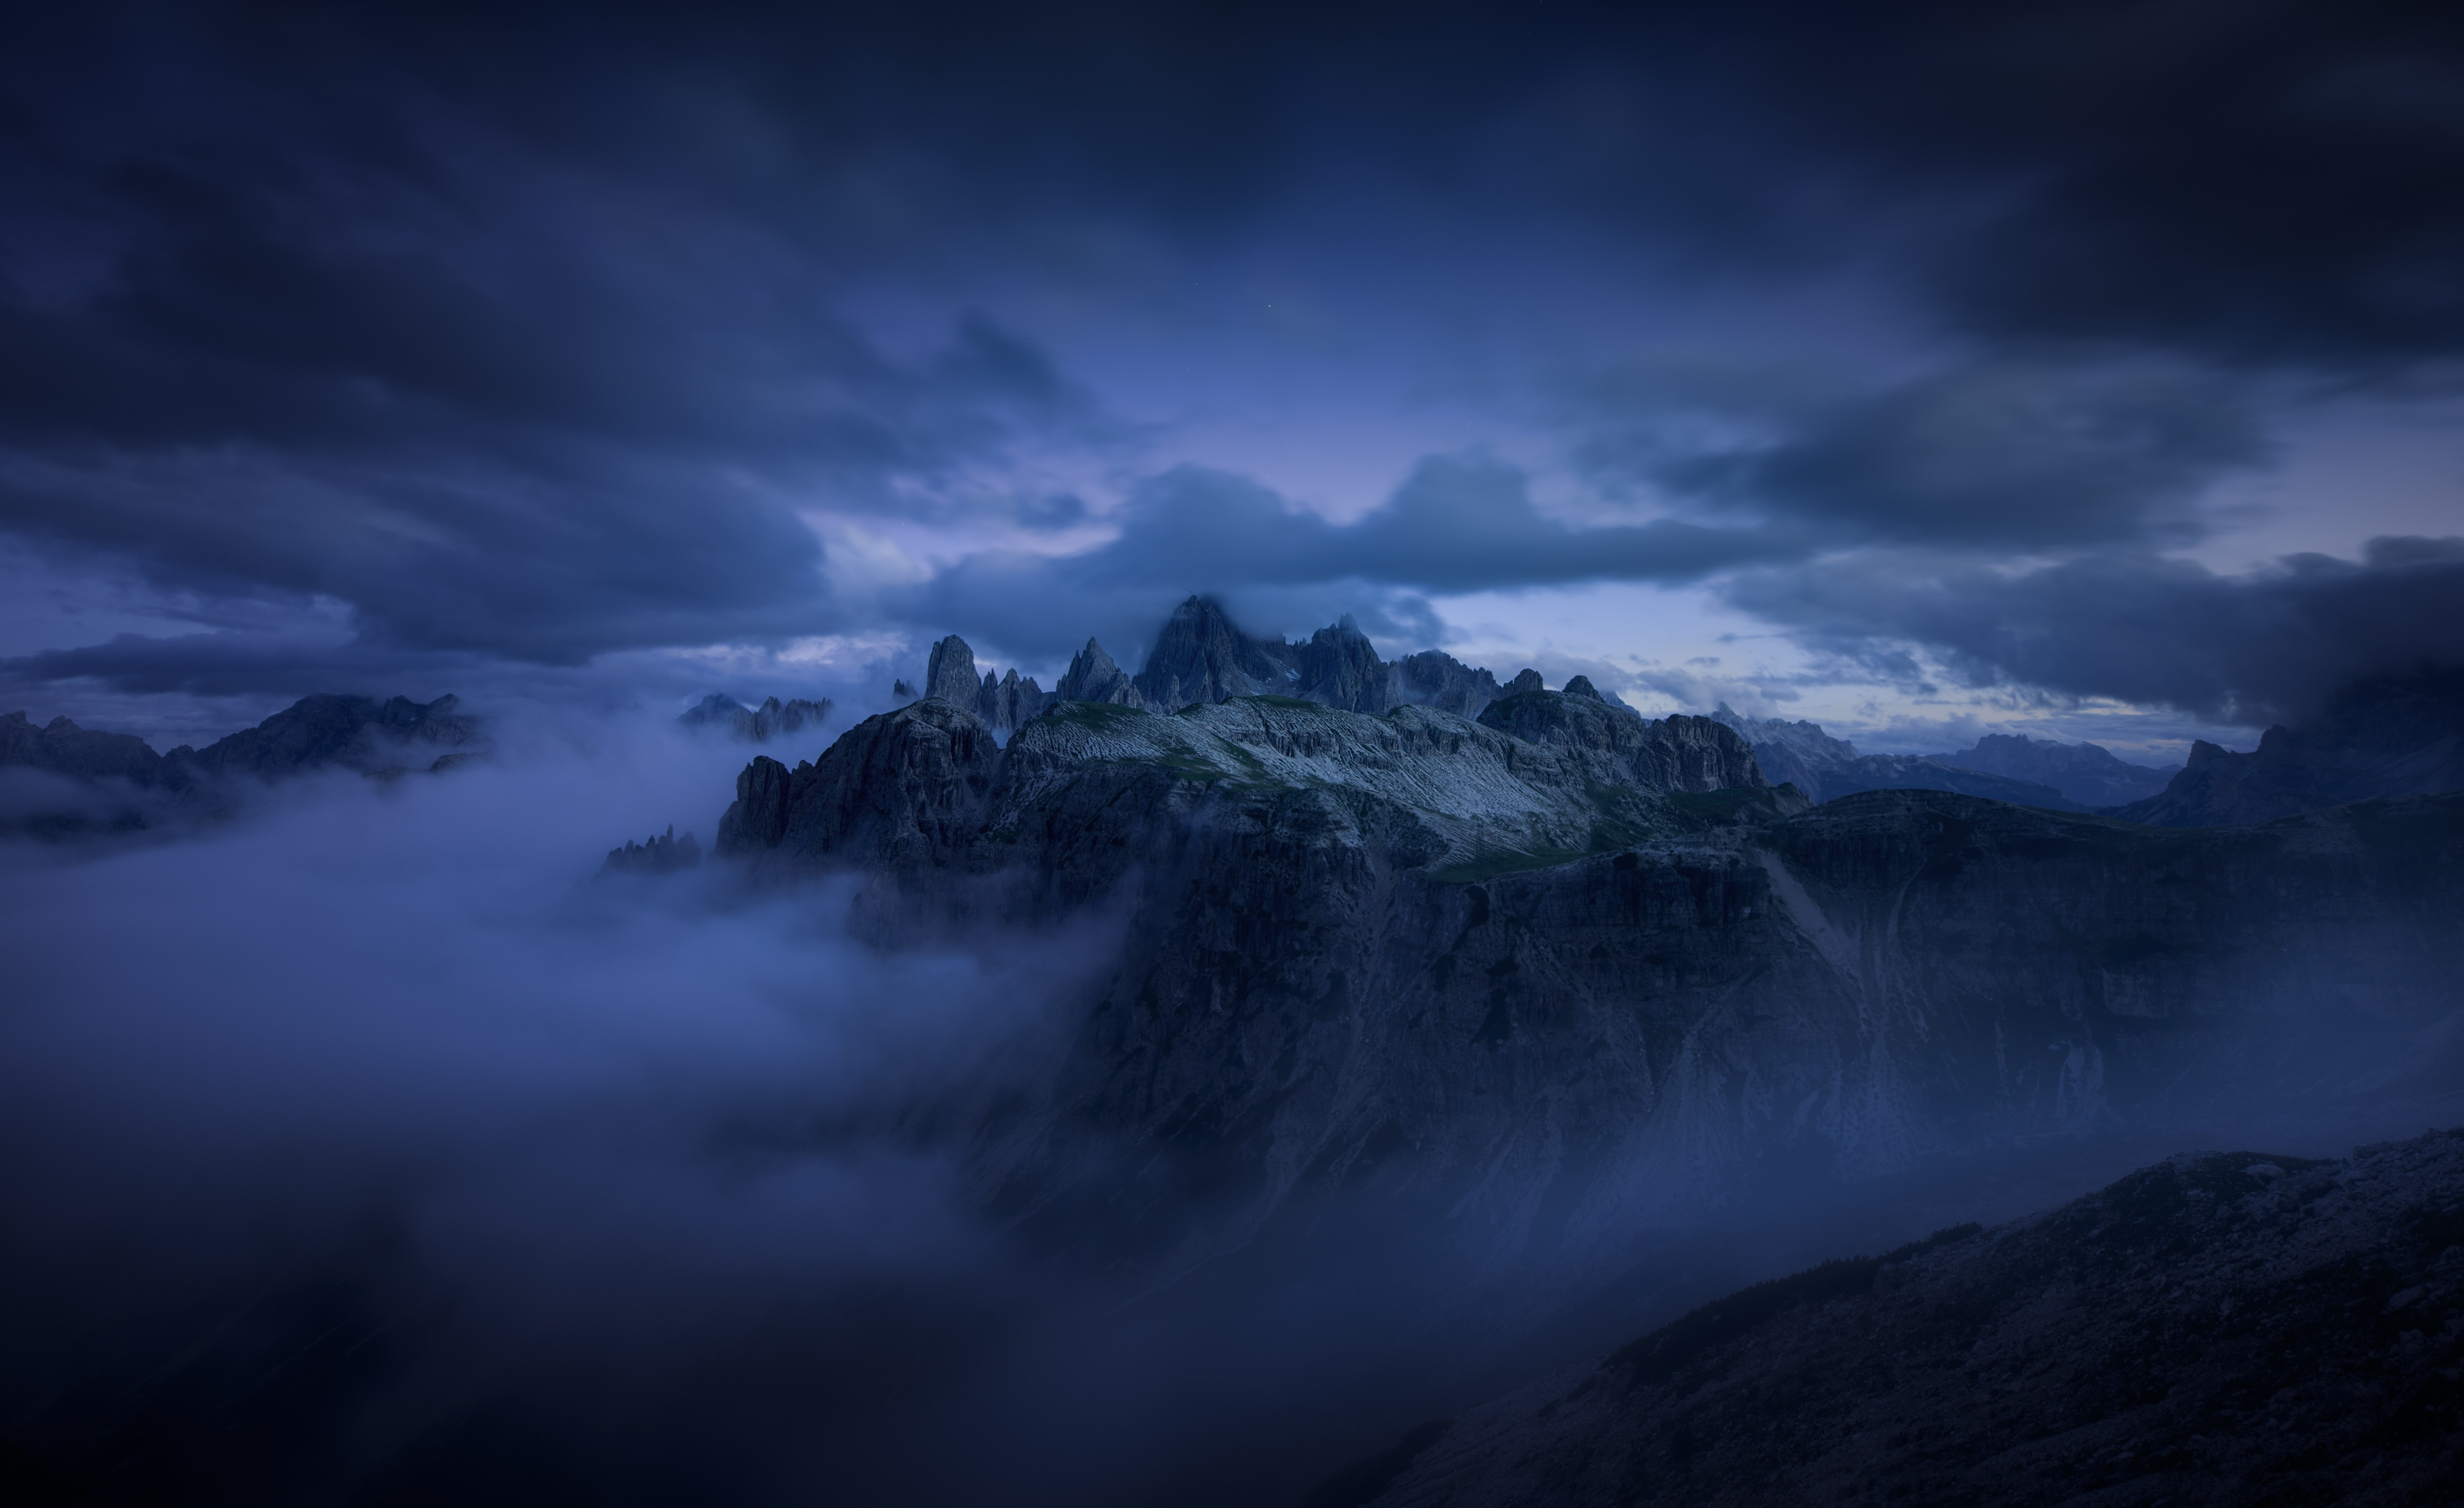 Mountains Cliff Covered Under Fog Mist 5k, HD Nature, 4k ...